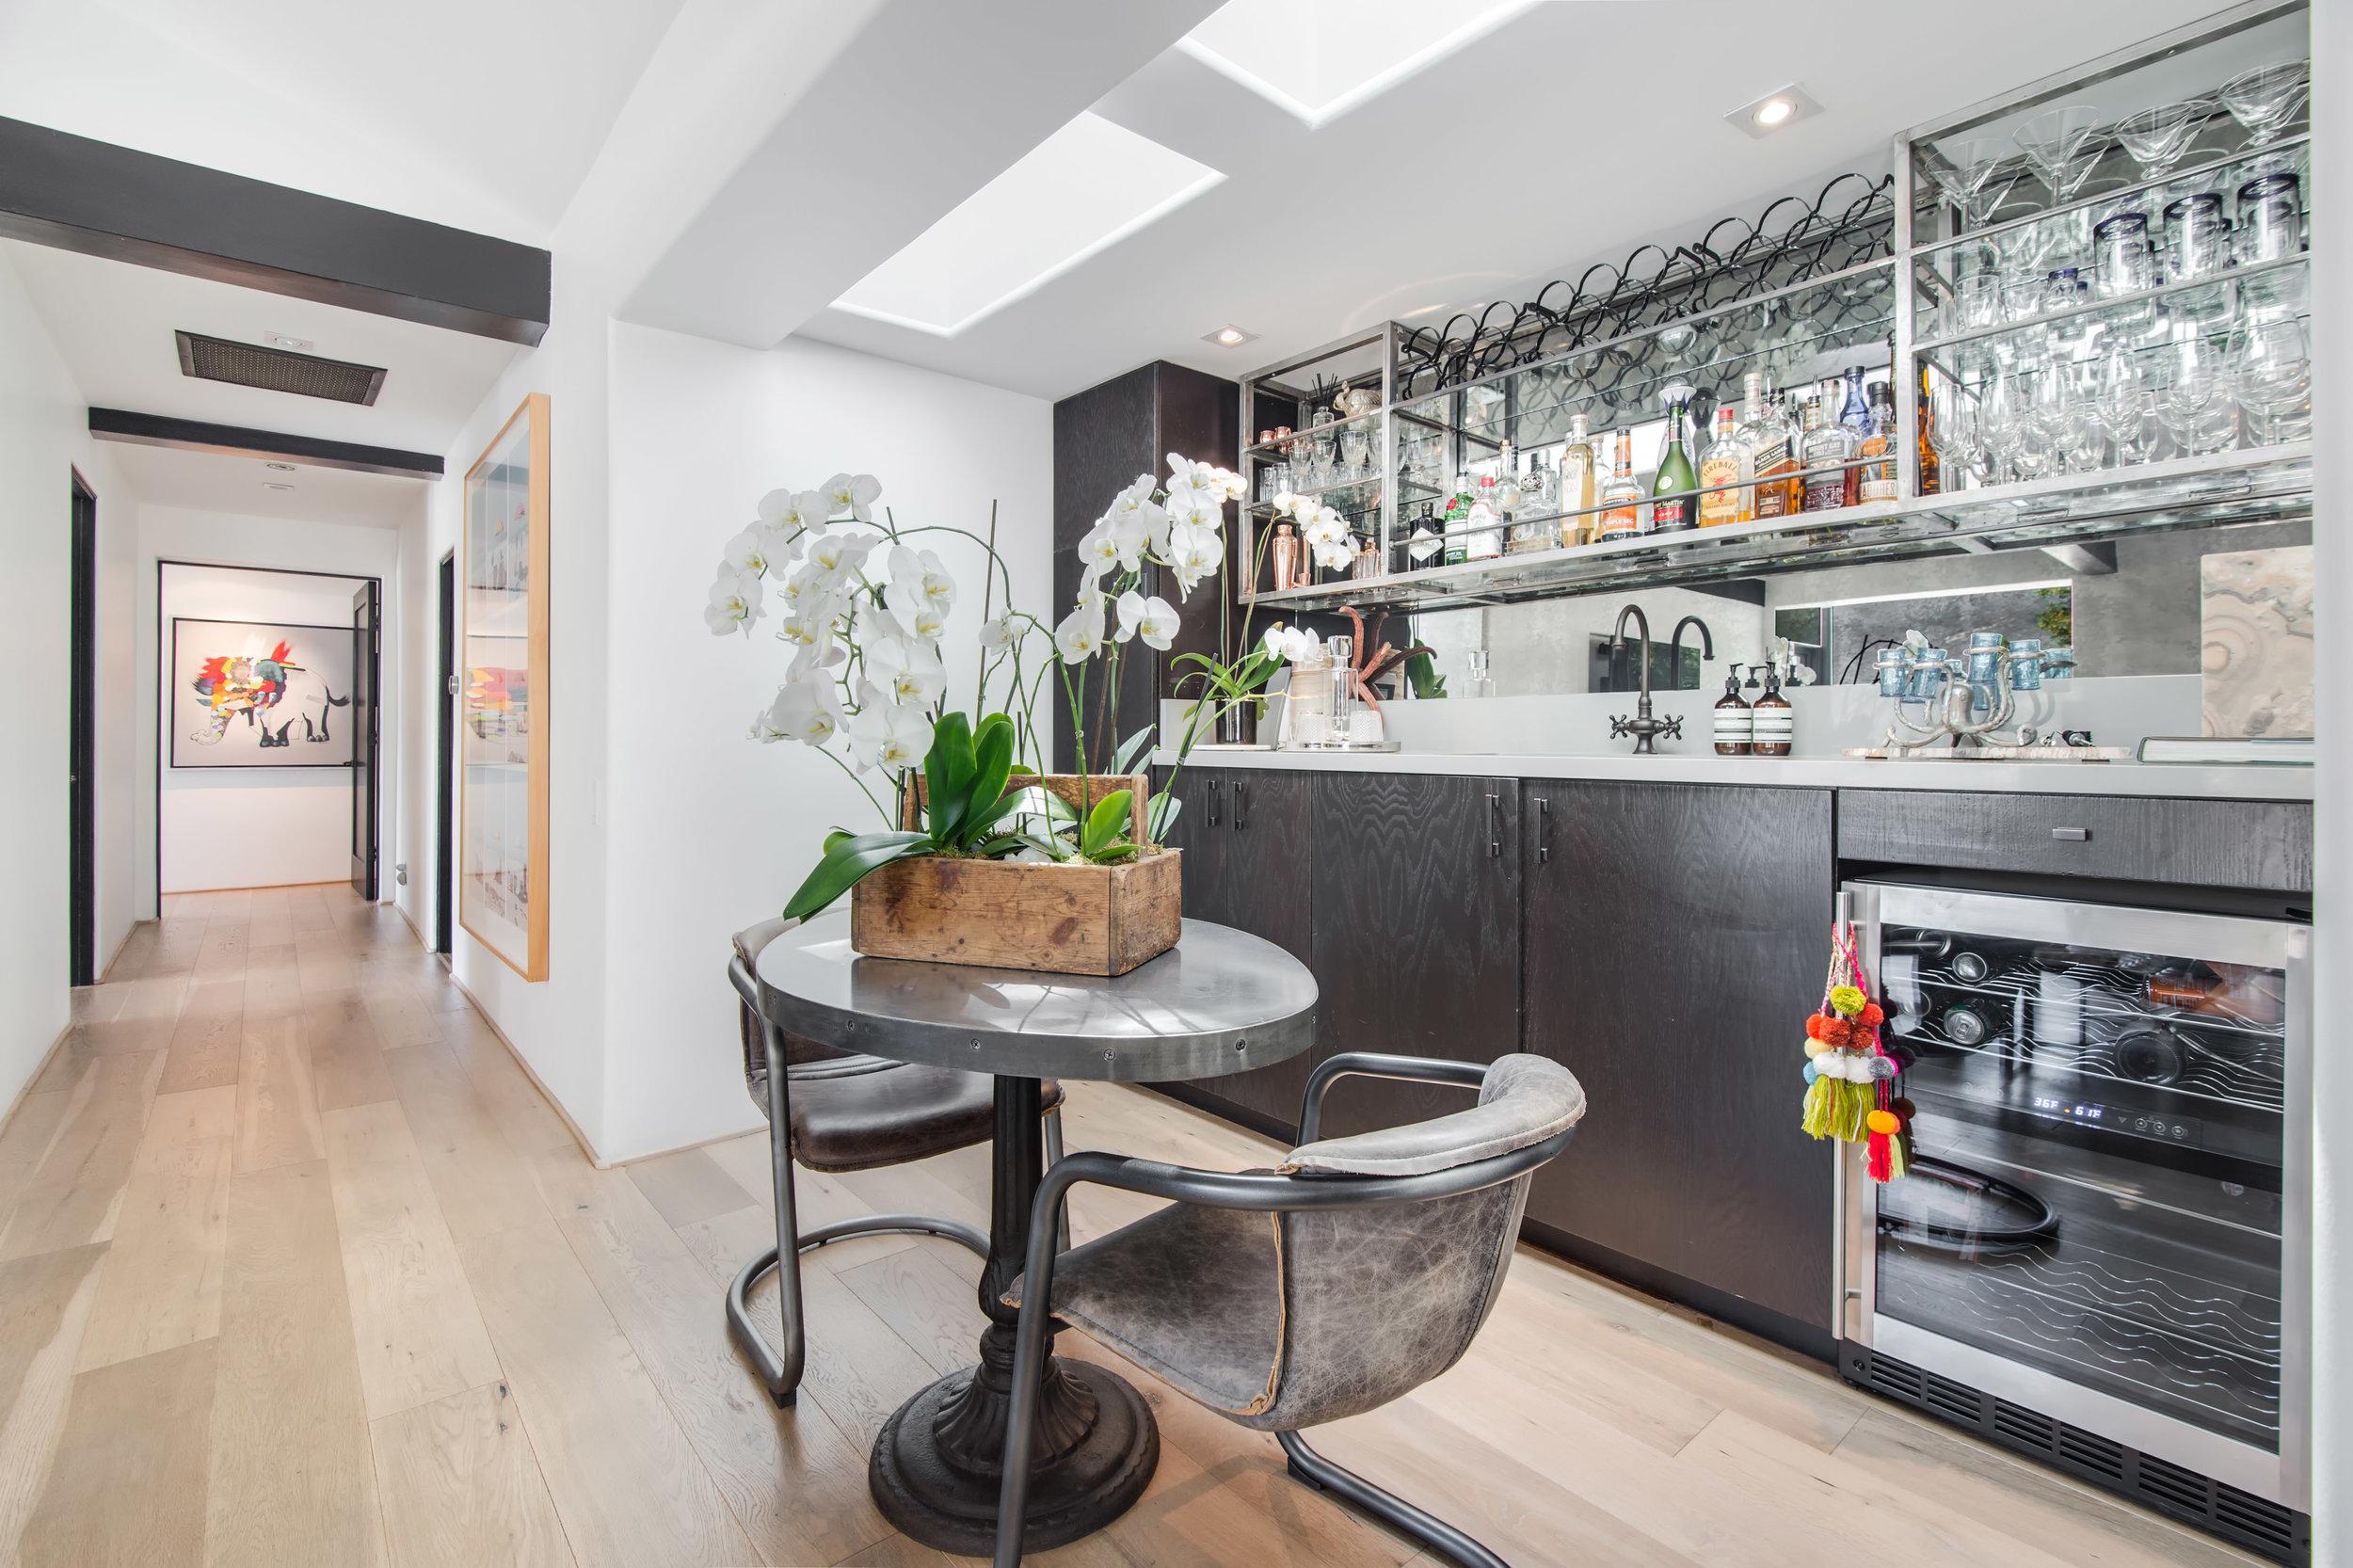 017 Living Room 26272 Cool Glen Way Malibu For Sale Luxury Real Estate.jpg